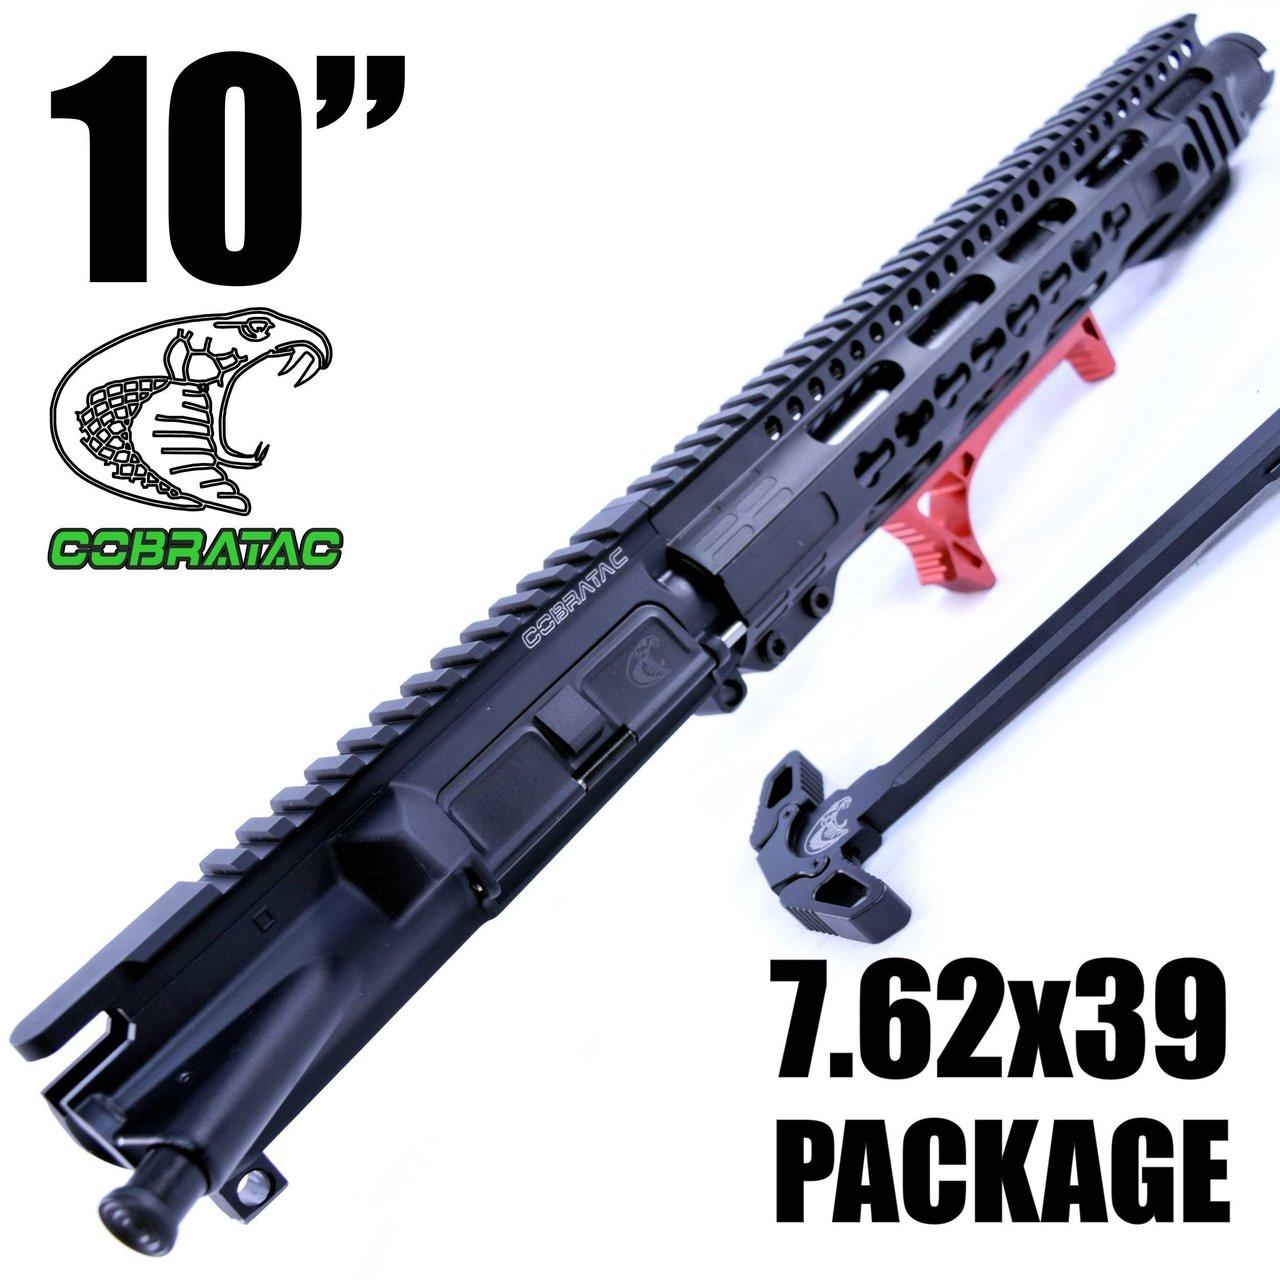 "10"" UPPER PACKAGE   1:10   NITRIDE   12"" 3-GUN PRO   7.62X39   BANSHEE SLIM  "